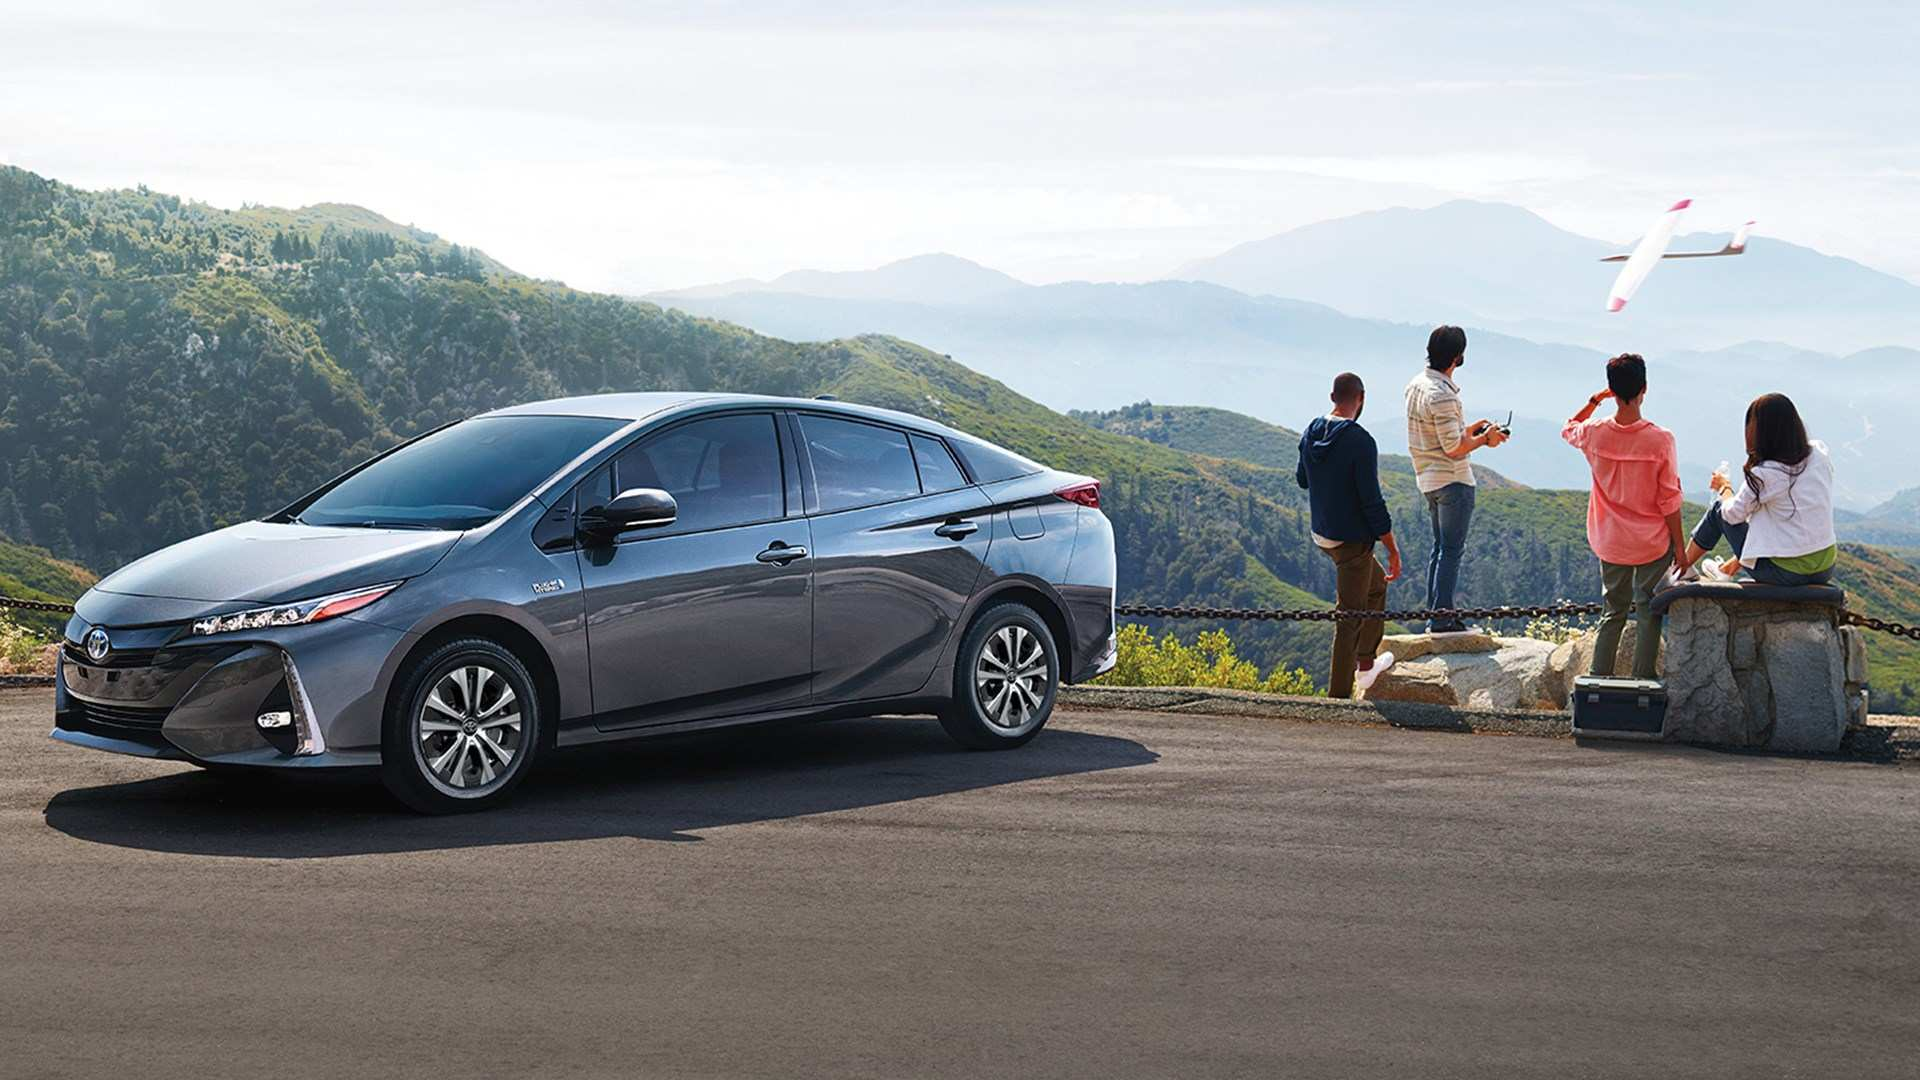 67 New Toyota Prius Prime 2020 Release with Toyota Prius Prime 2020